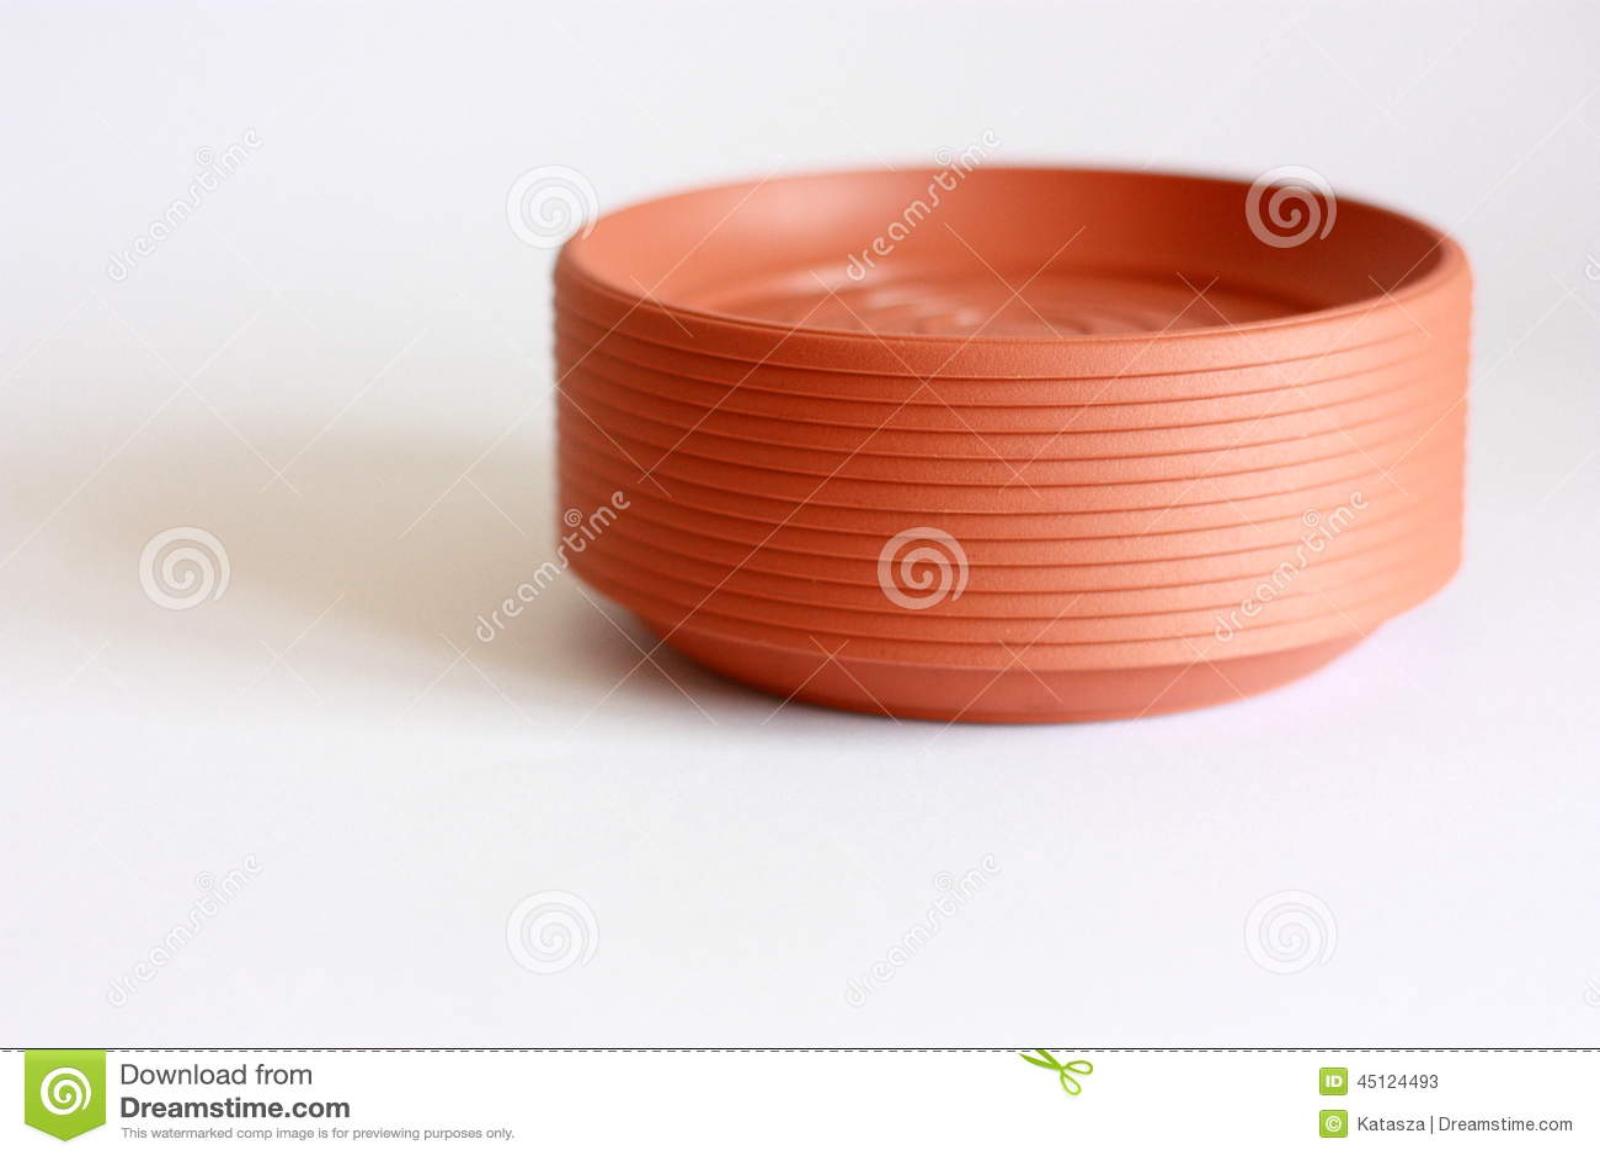 Dreamstime.com & Flower pot saucers stock image. Image of saucer empty - 45124493